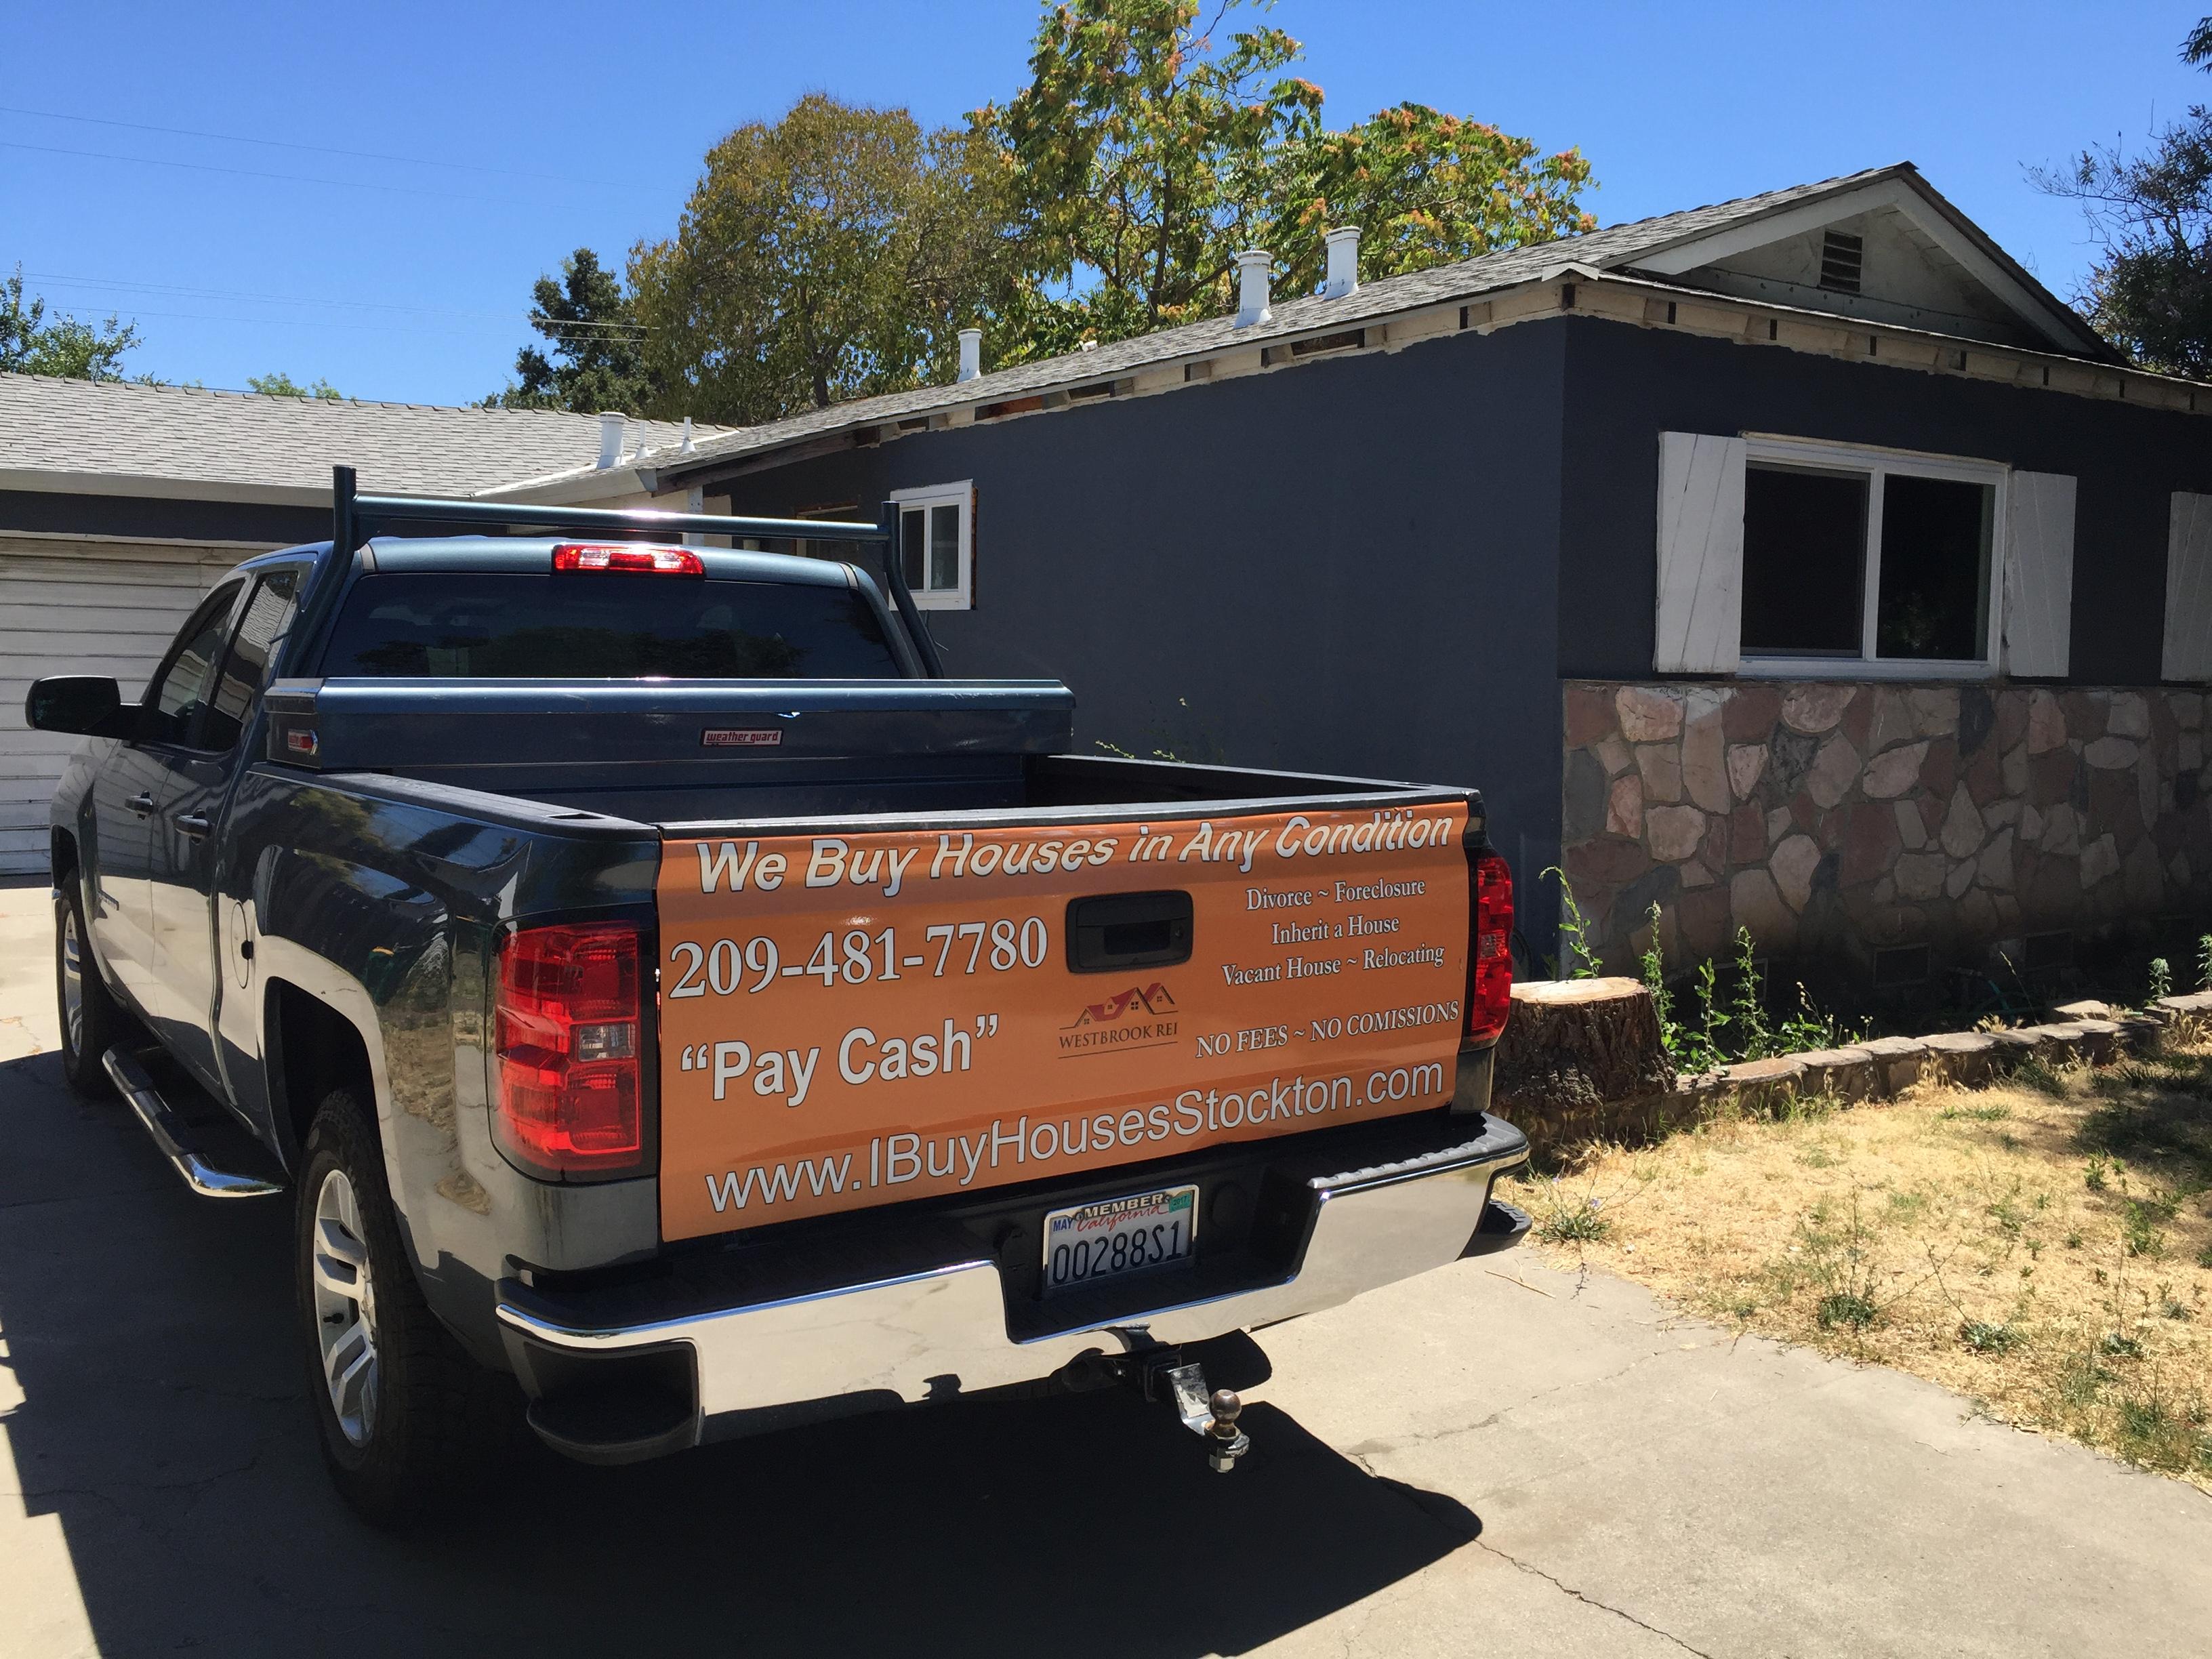 House For Sale 2454 E 8th St Stockton CA Investor Special